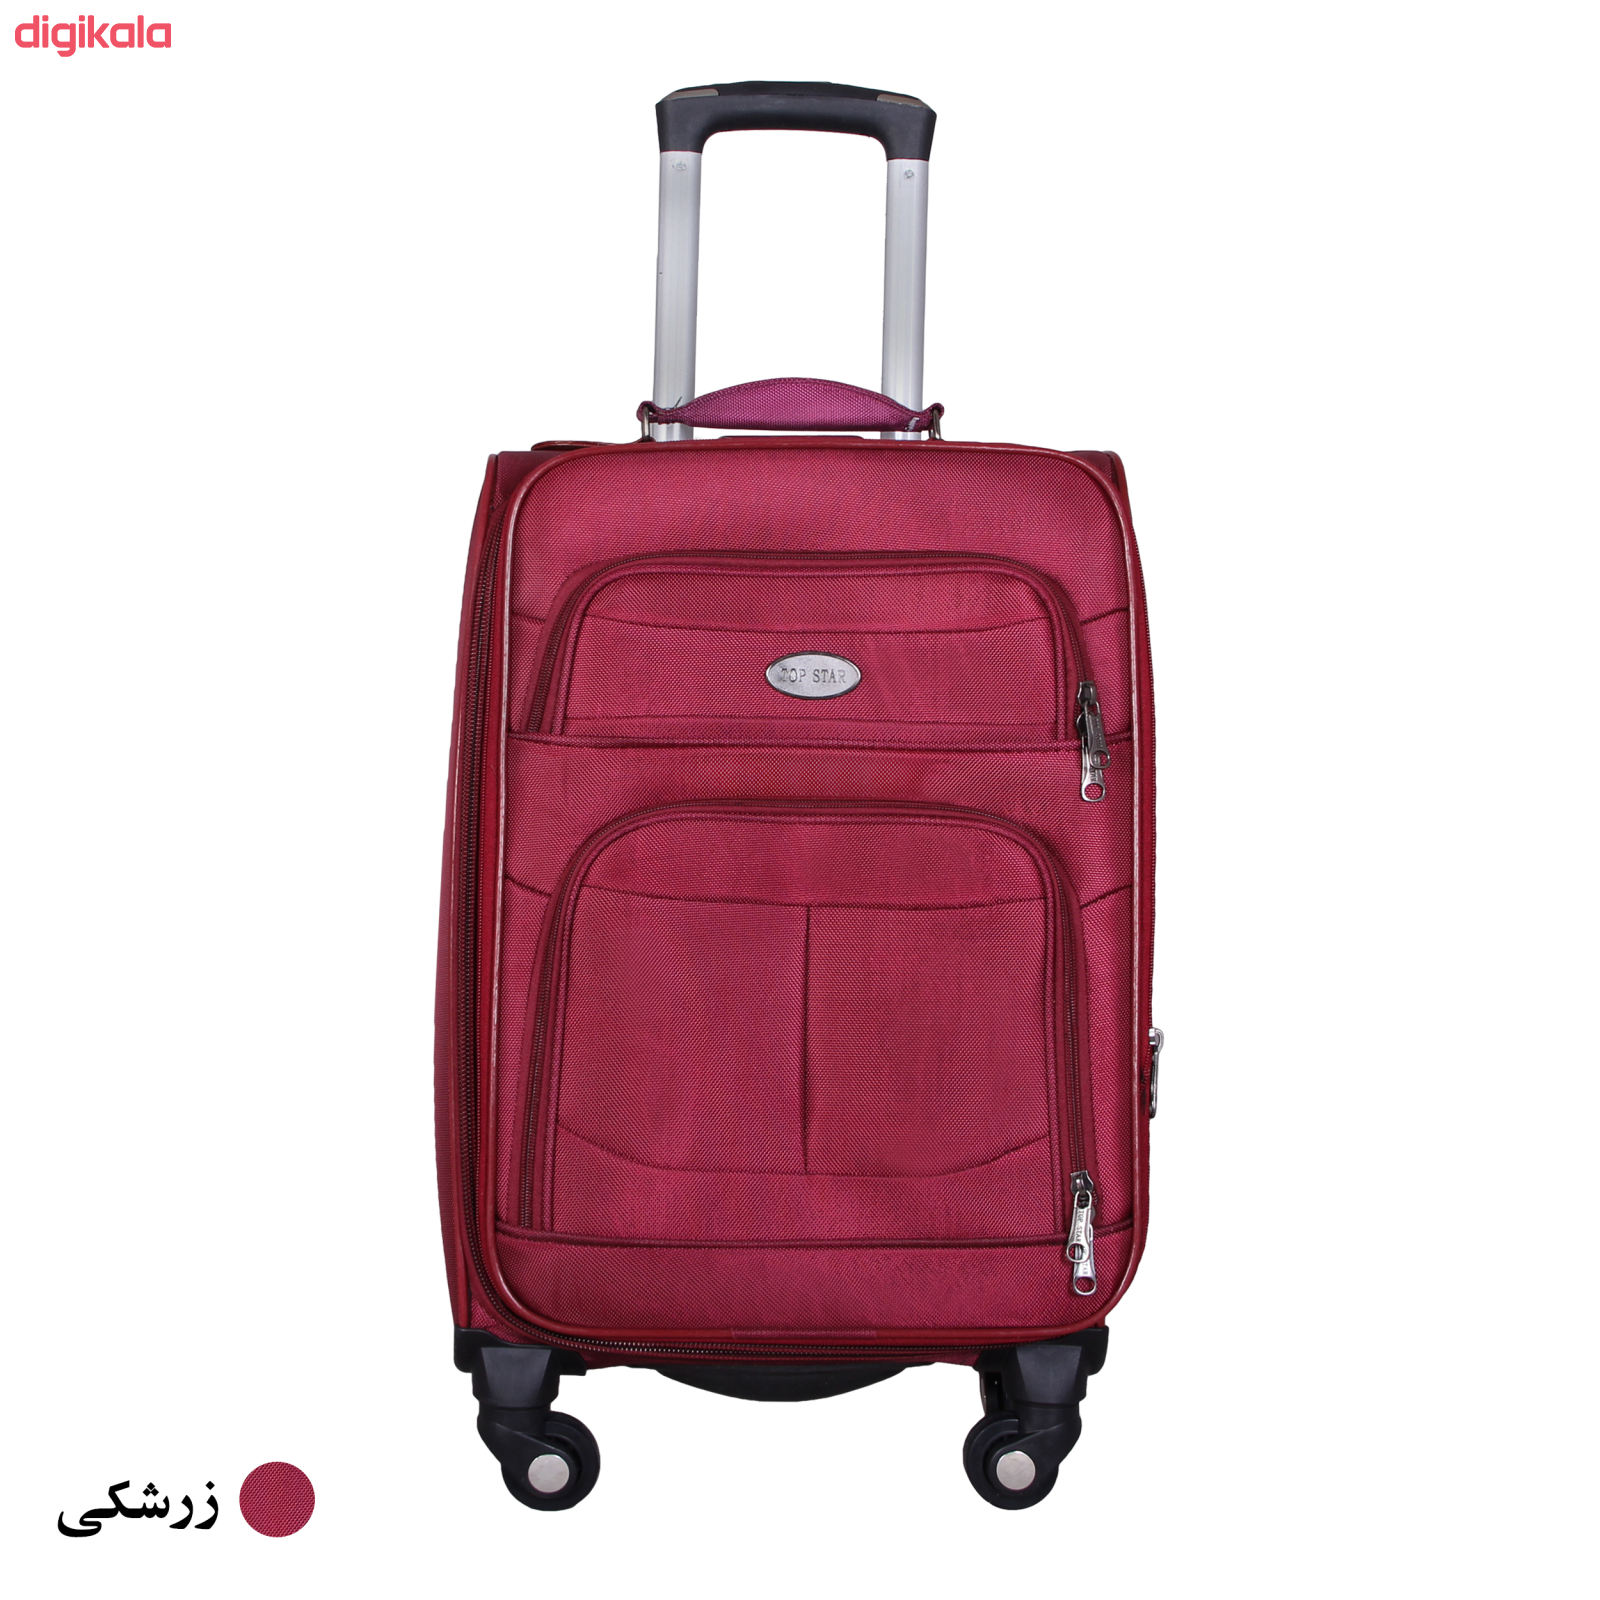 مجموعه سه عددی چمدان کدA1034 main 1 3